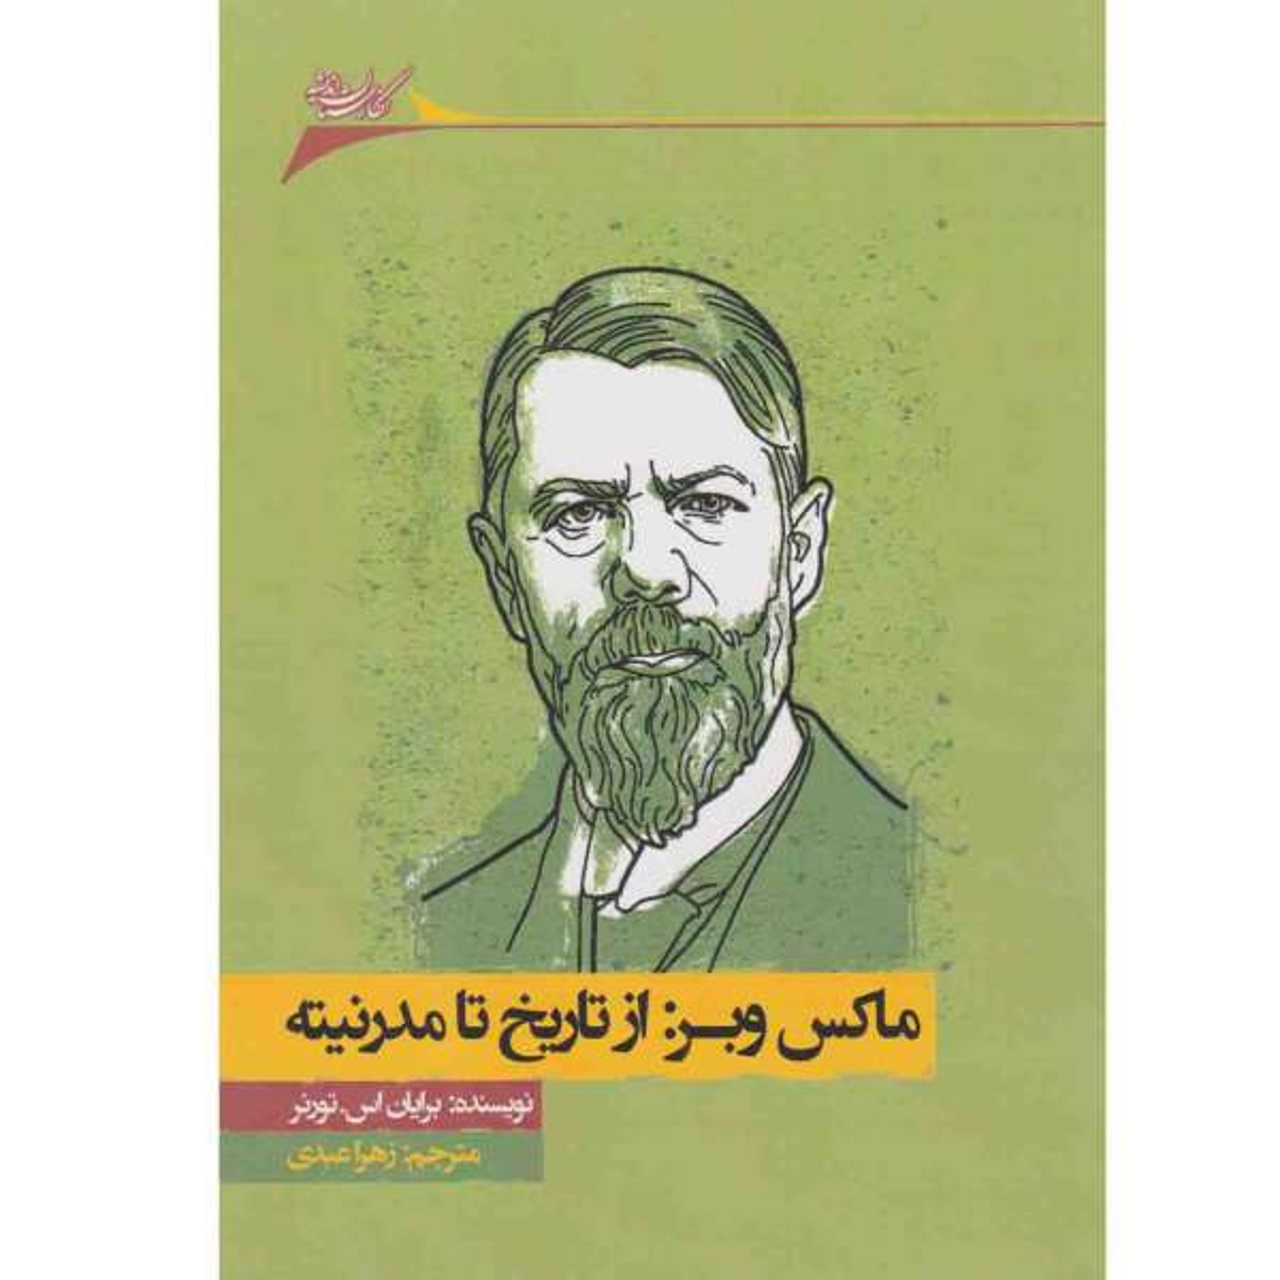 کتاب ماکس وبر:از تاریخ تا مدرنیته اثر برایان اس.تورنر نشر نگارستان اندیشه